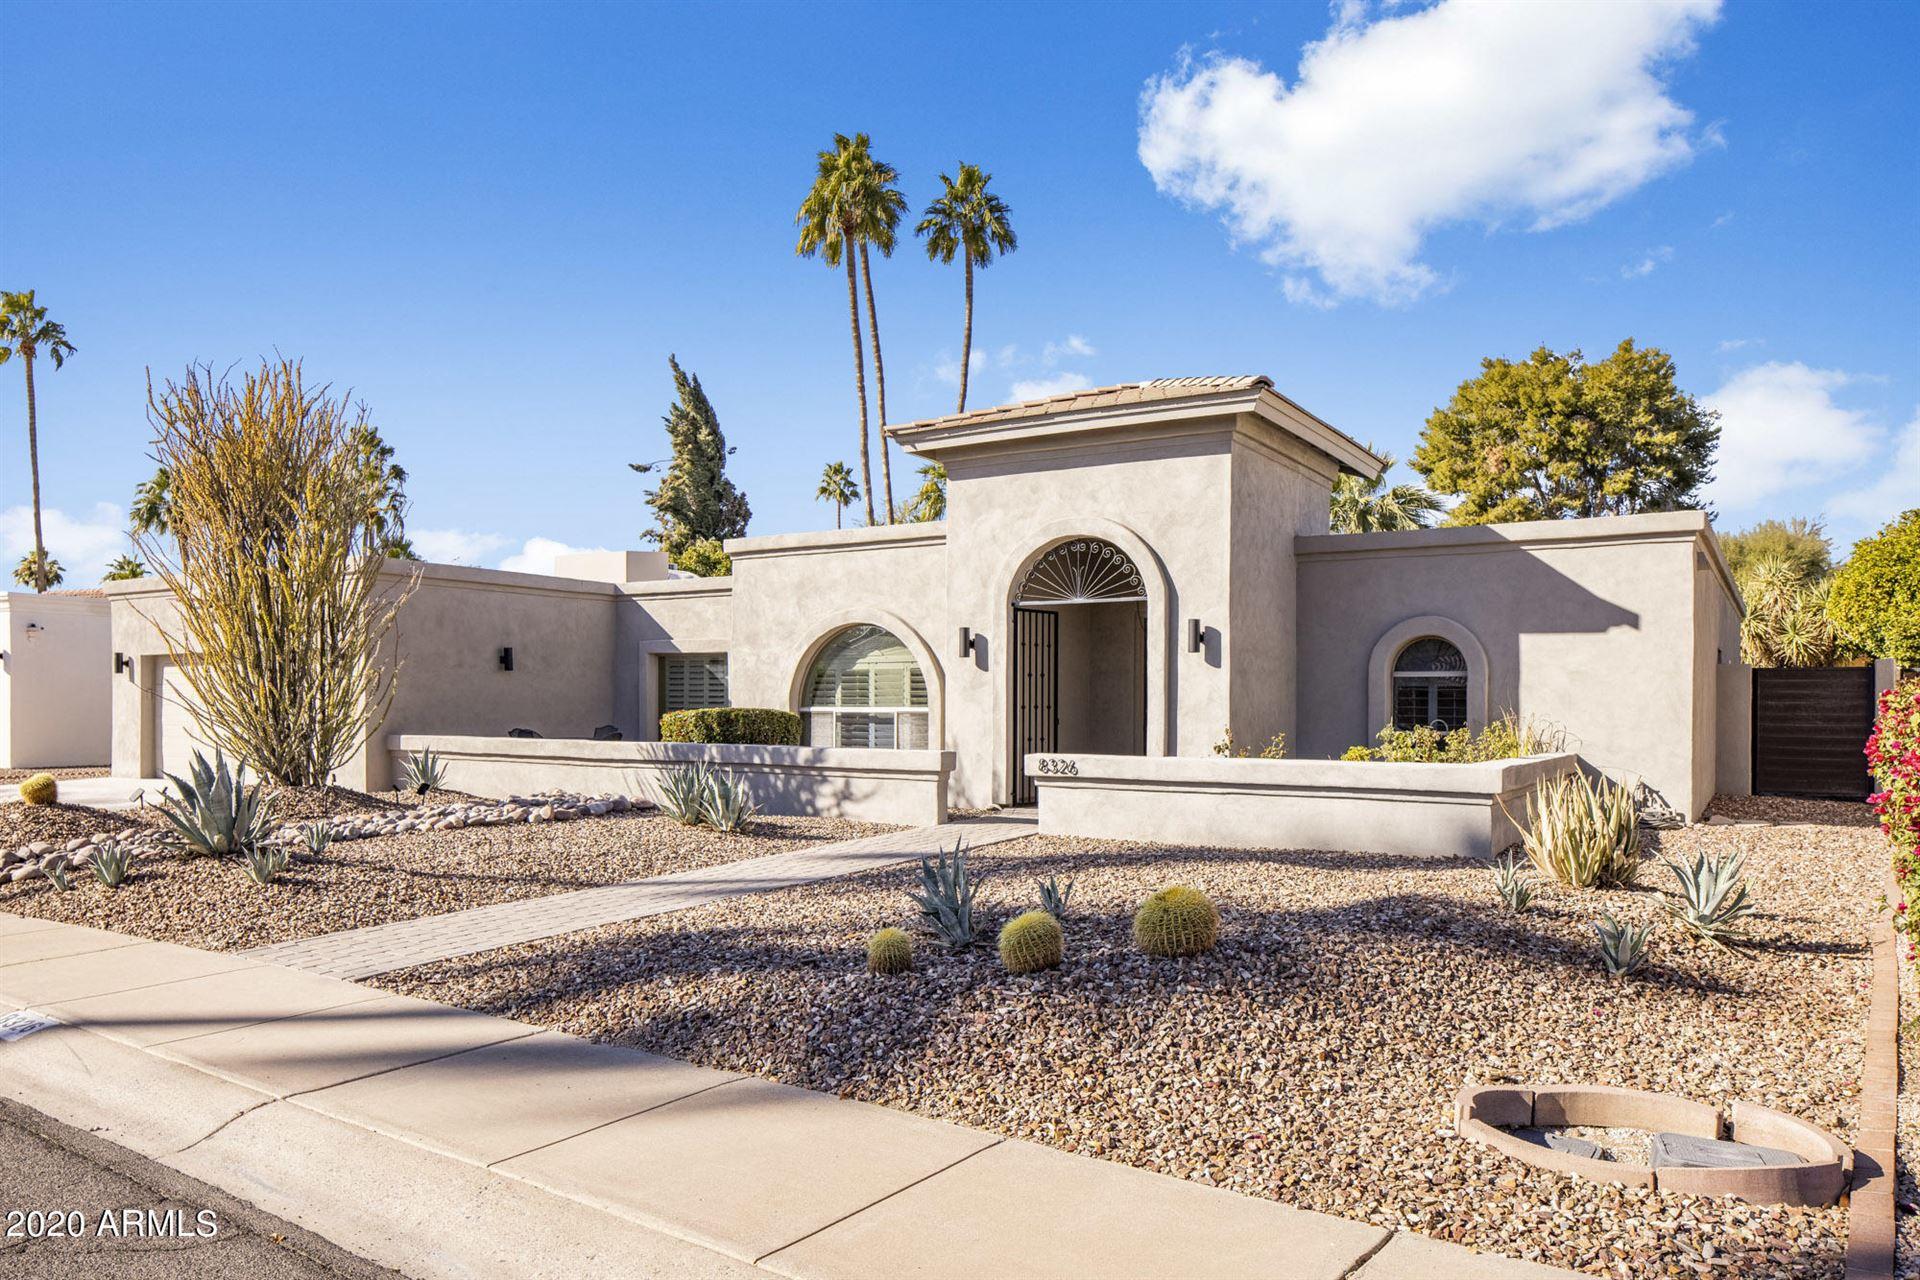 Photo for 8326 E SAN ROSENDO Drive, Scottsdale, AZ 85258 (MLS # 6176785)